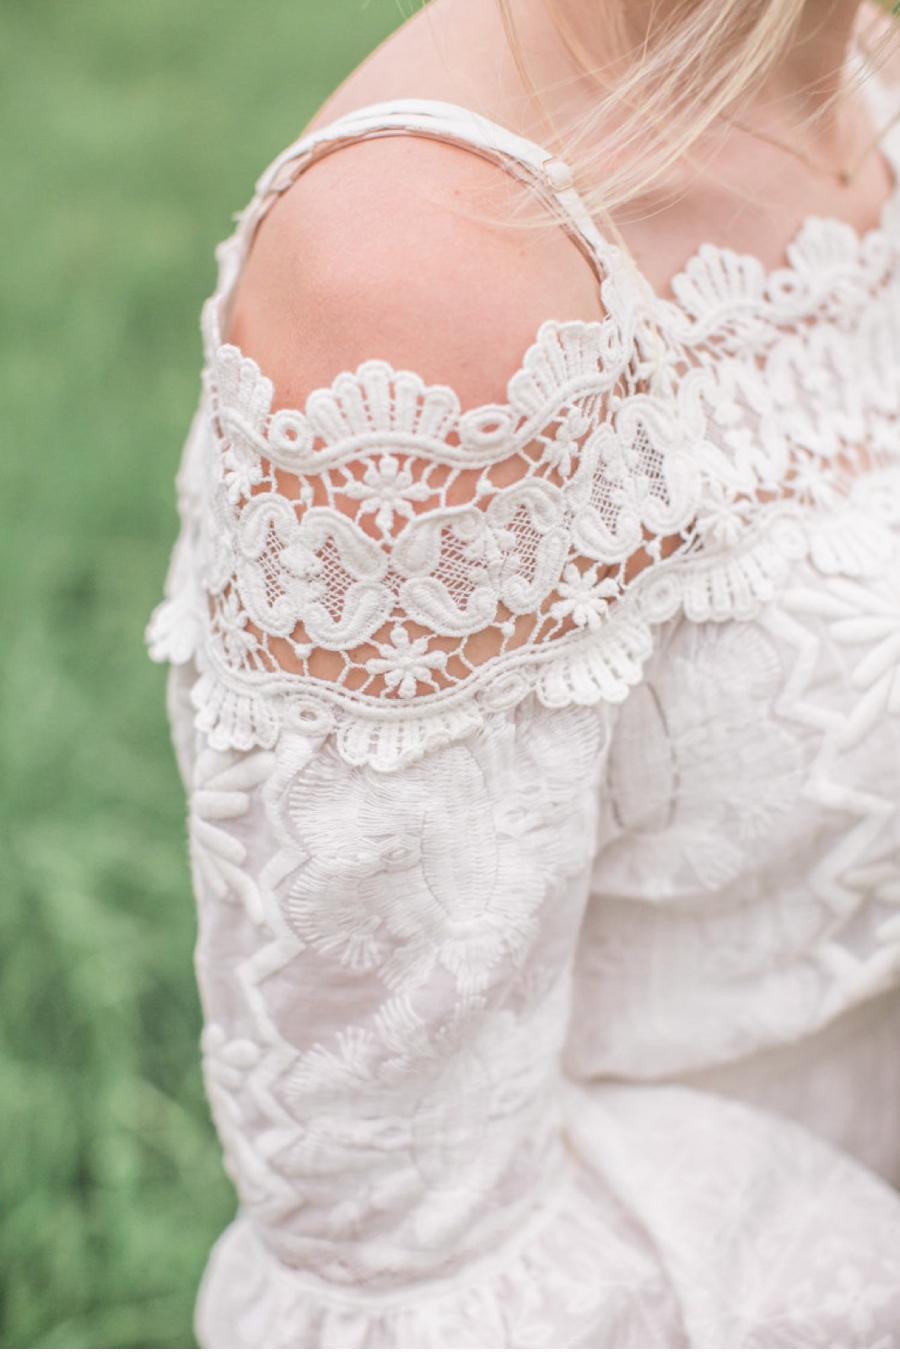 Heirloom-Wedding-Dress-Details